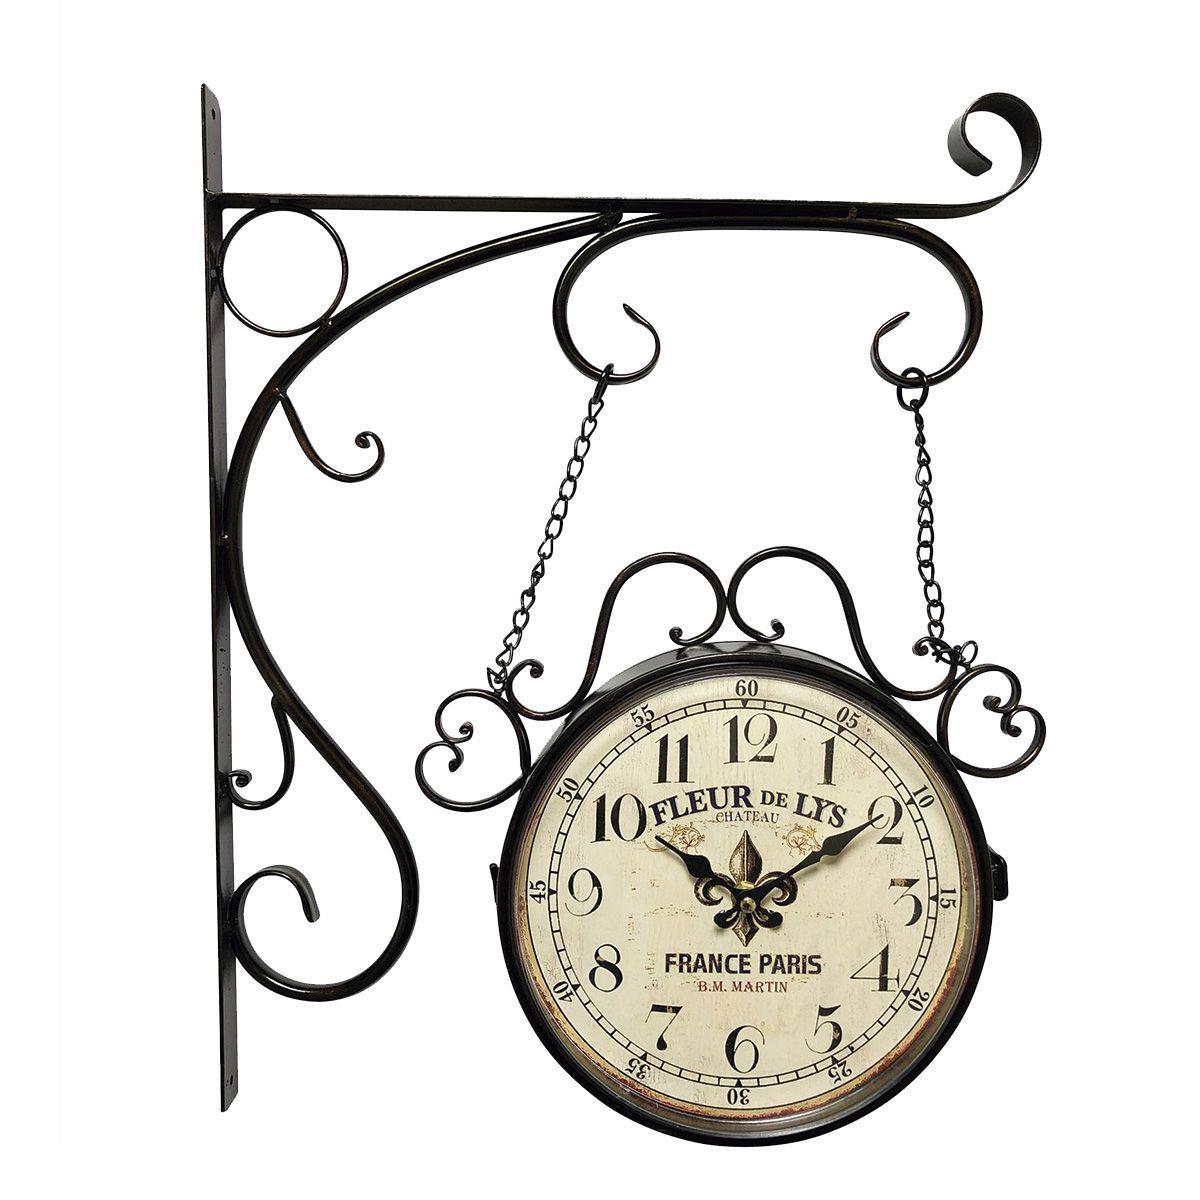 Relógio de Parede dupla face c/ corrente Fleur de Lys France